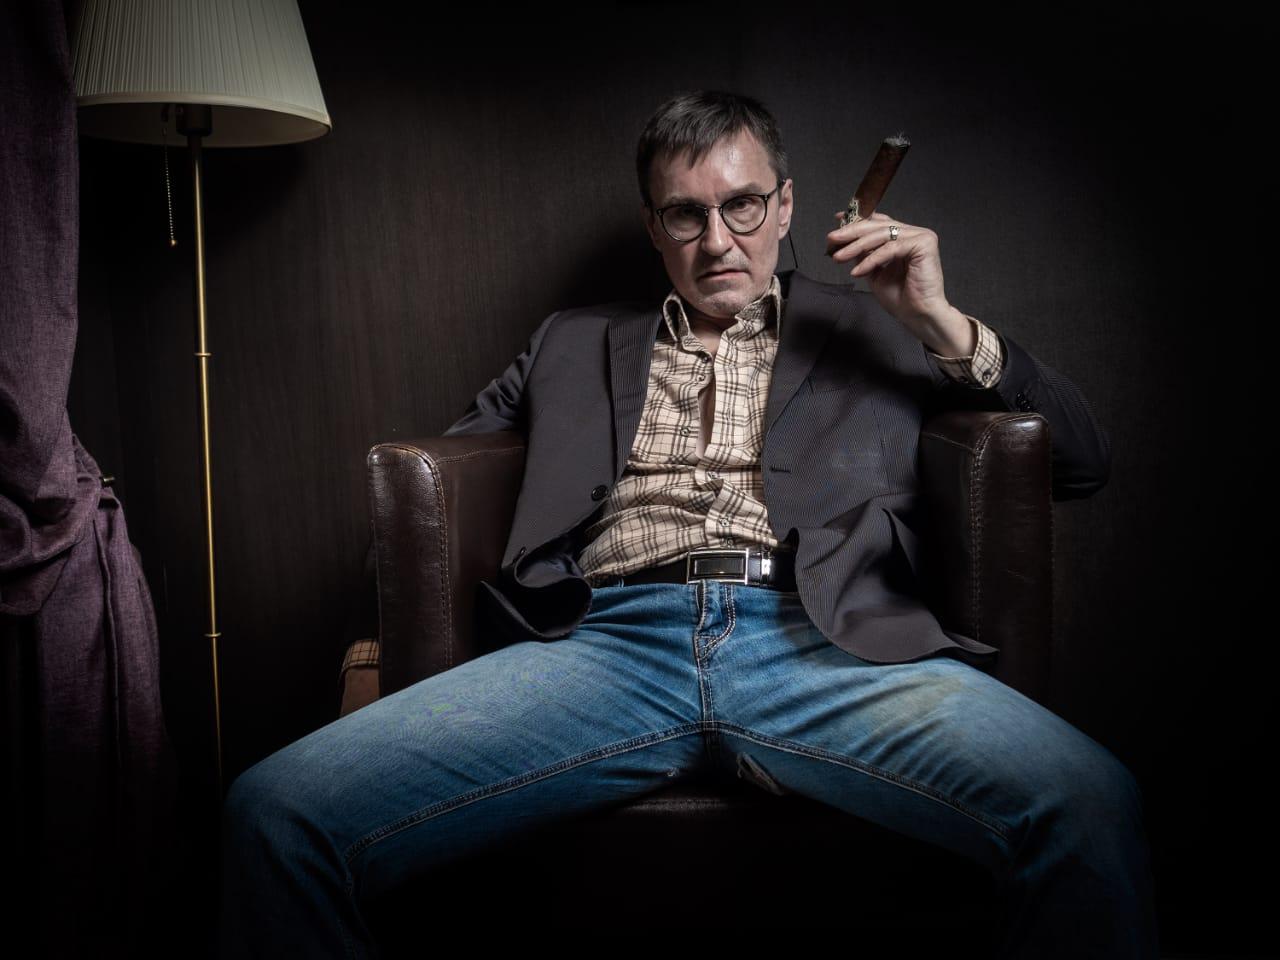 Ещё одна фотосессия от известного фотохудожника Марка Рассказова